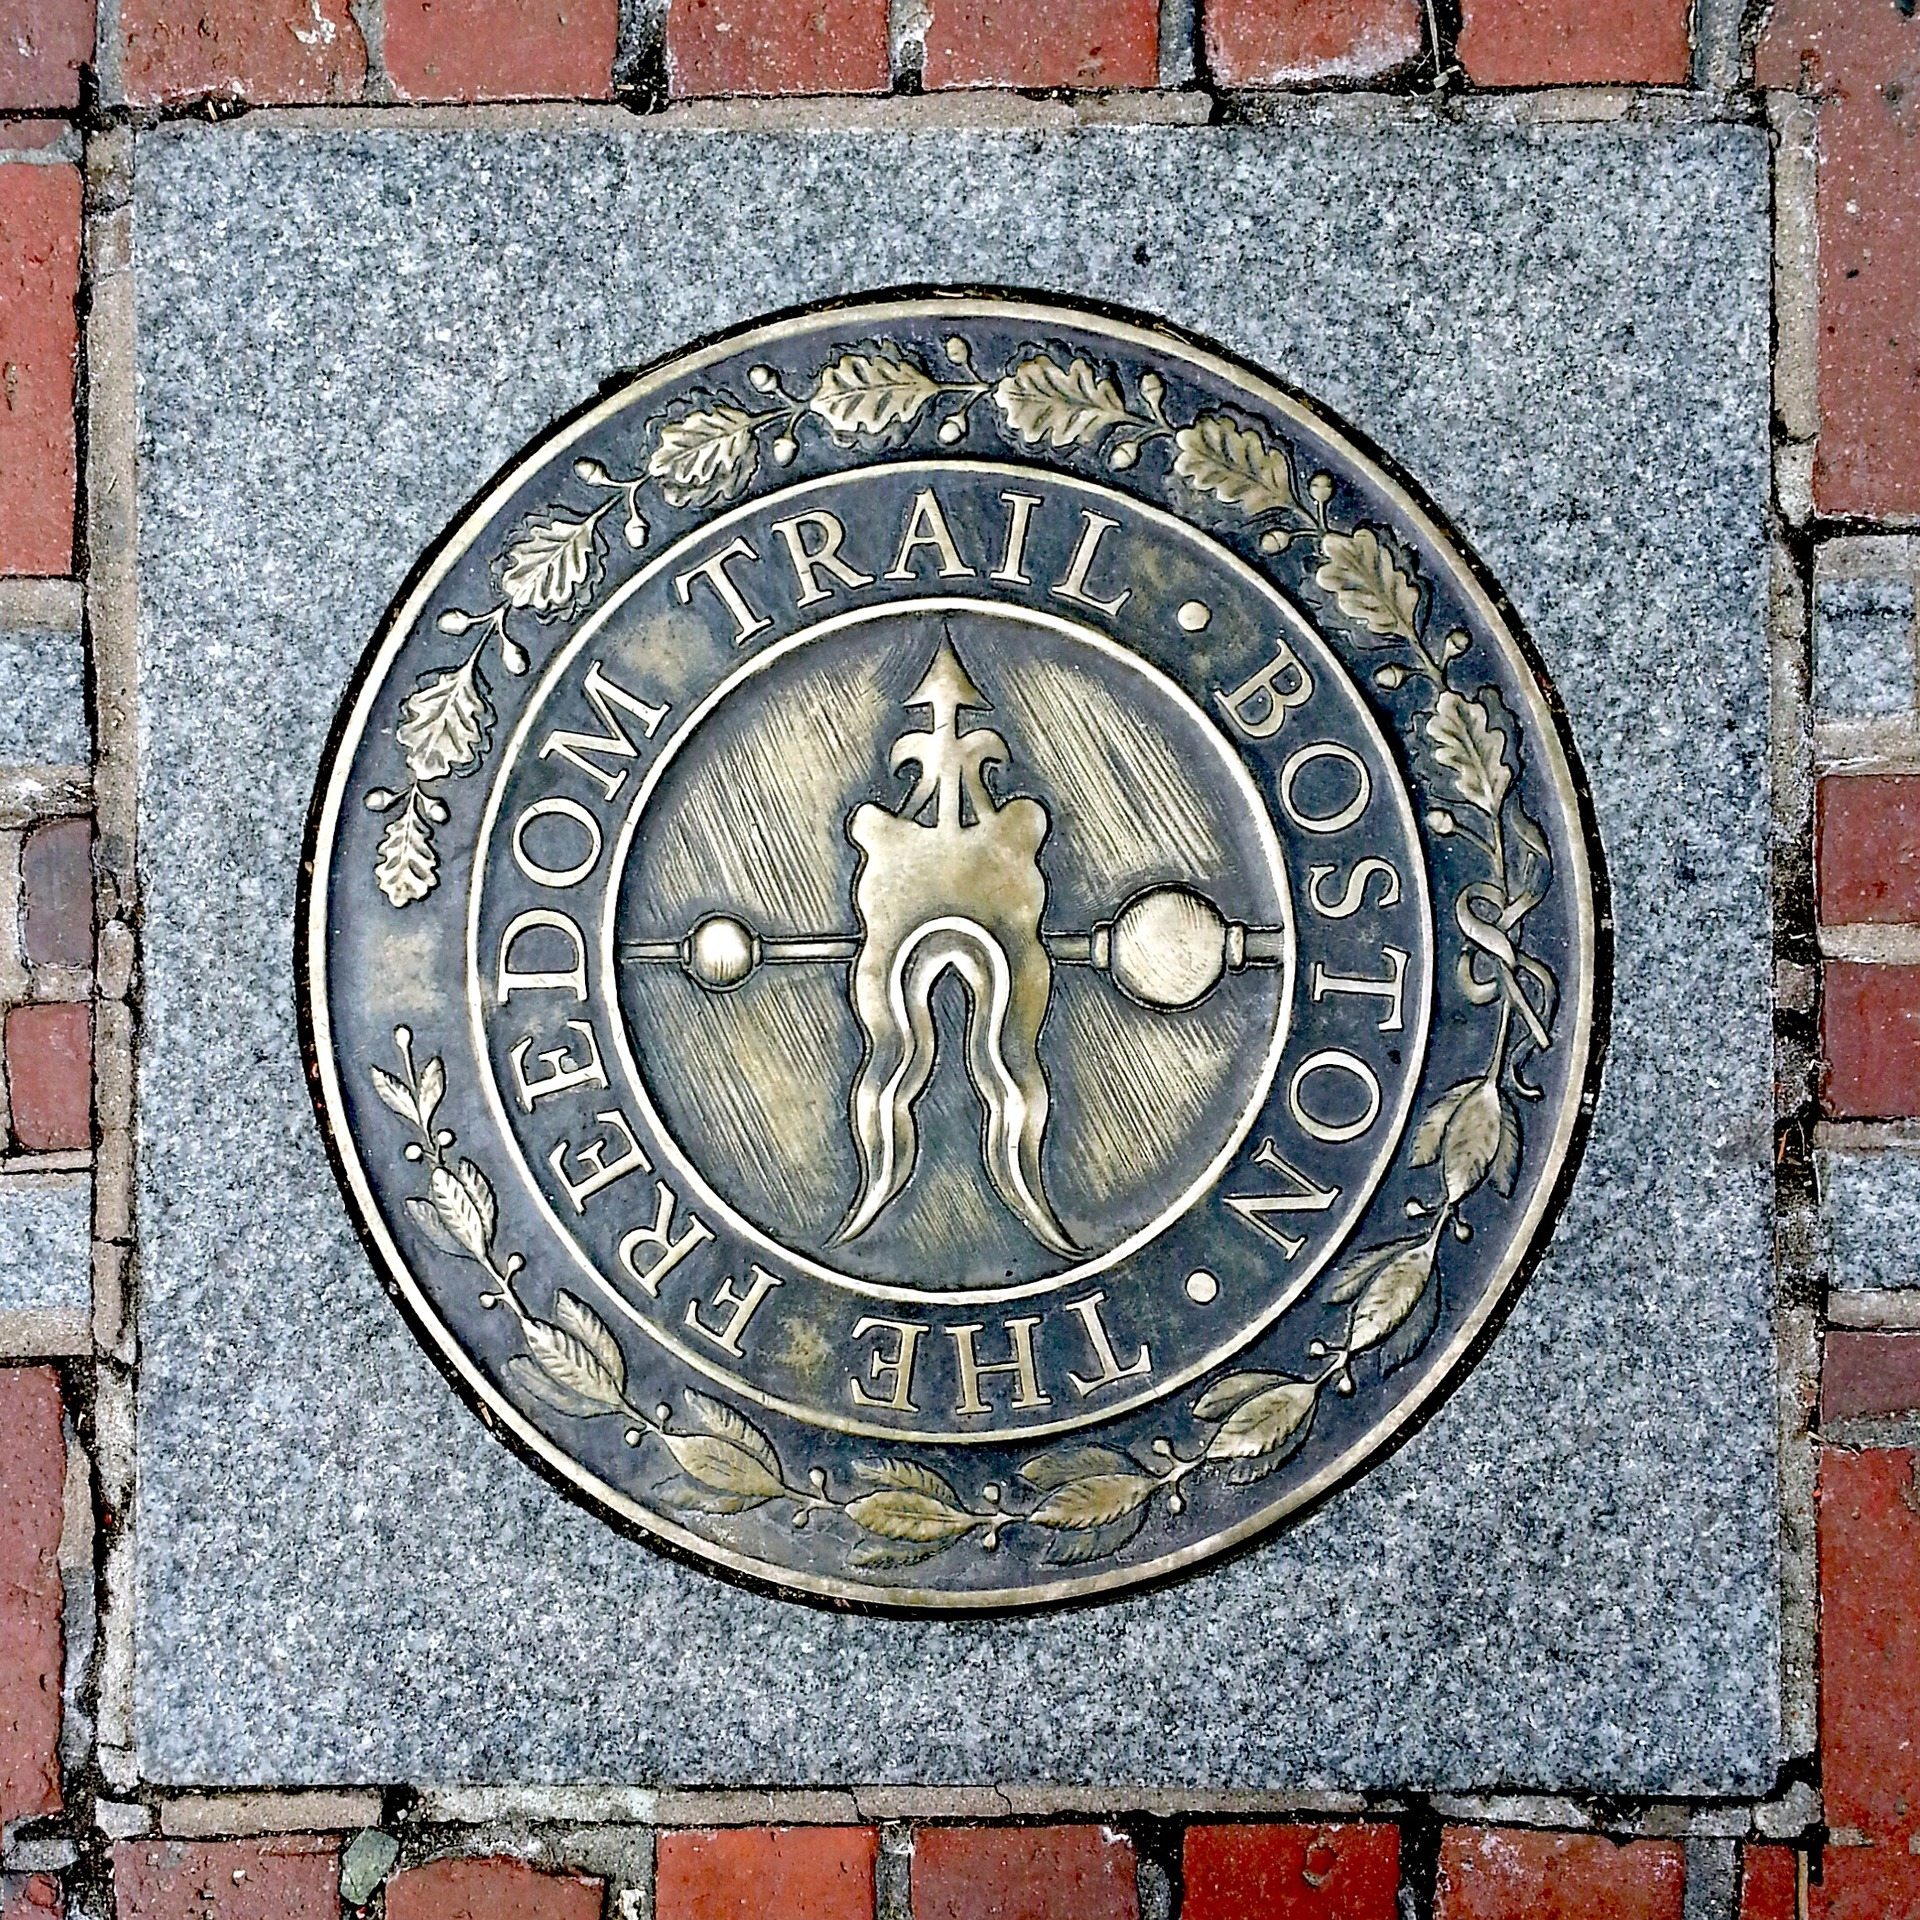 Freedom Trail in Boston, Massachusetts